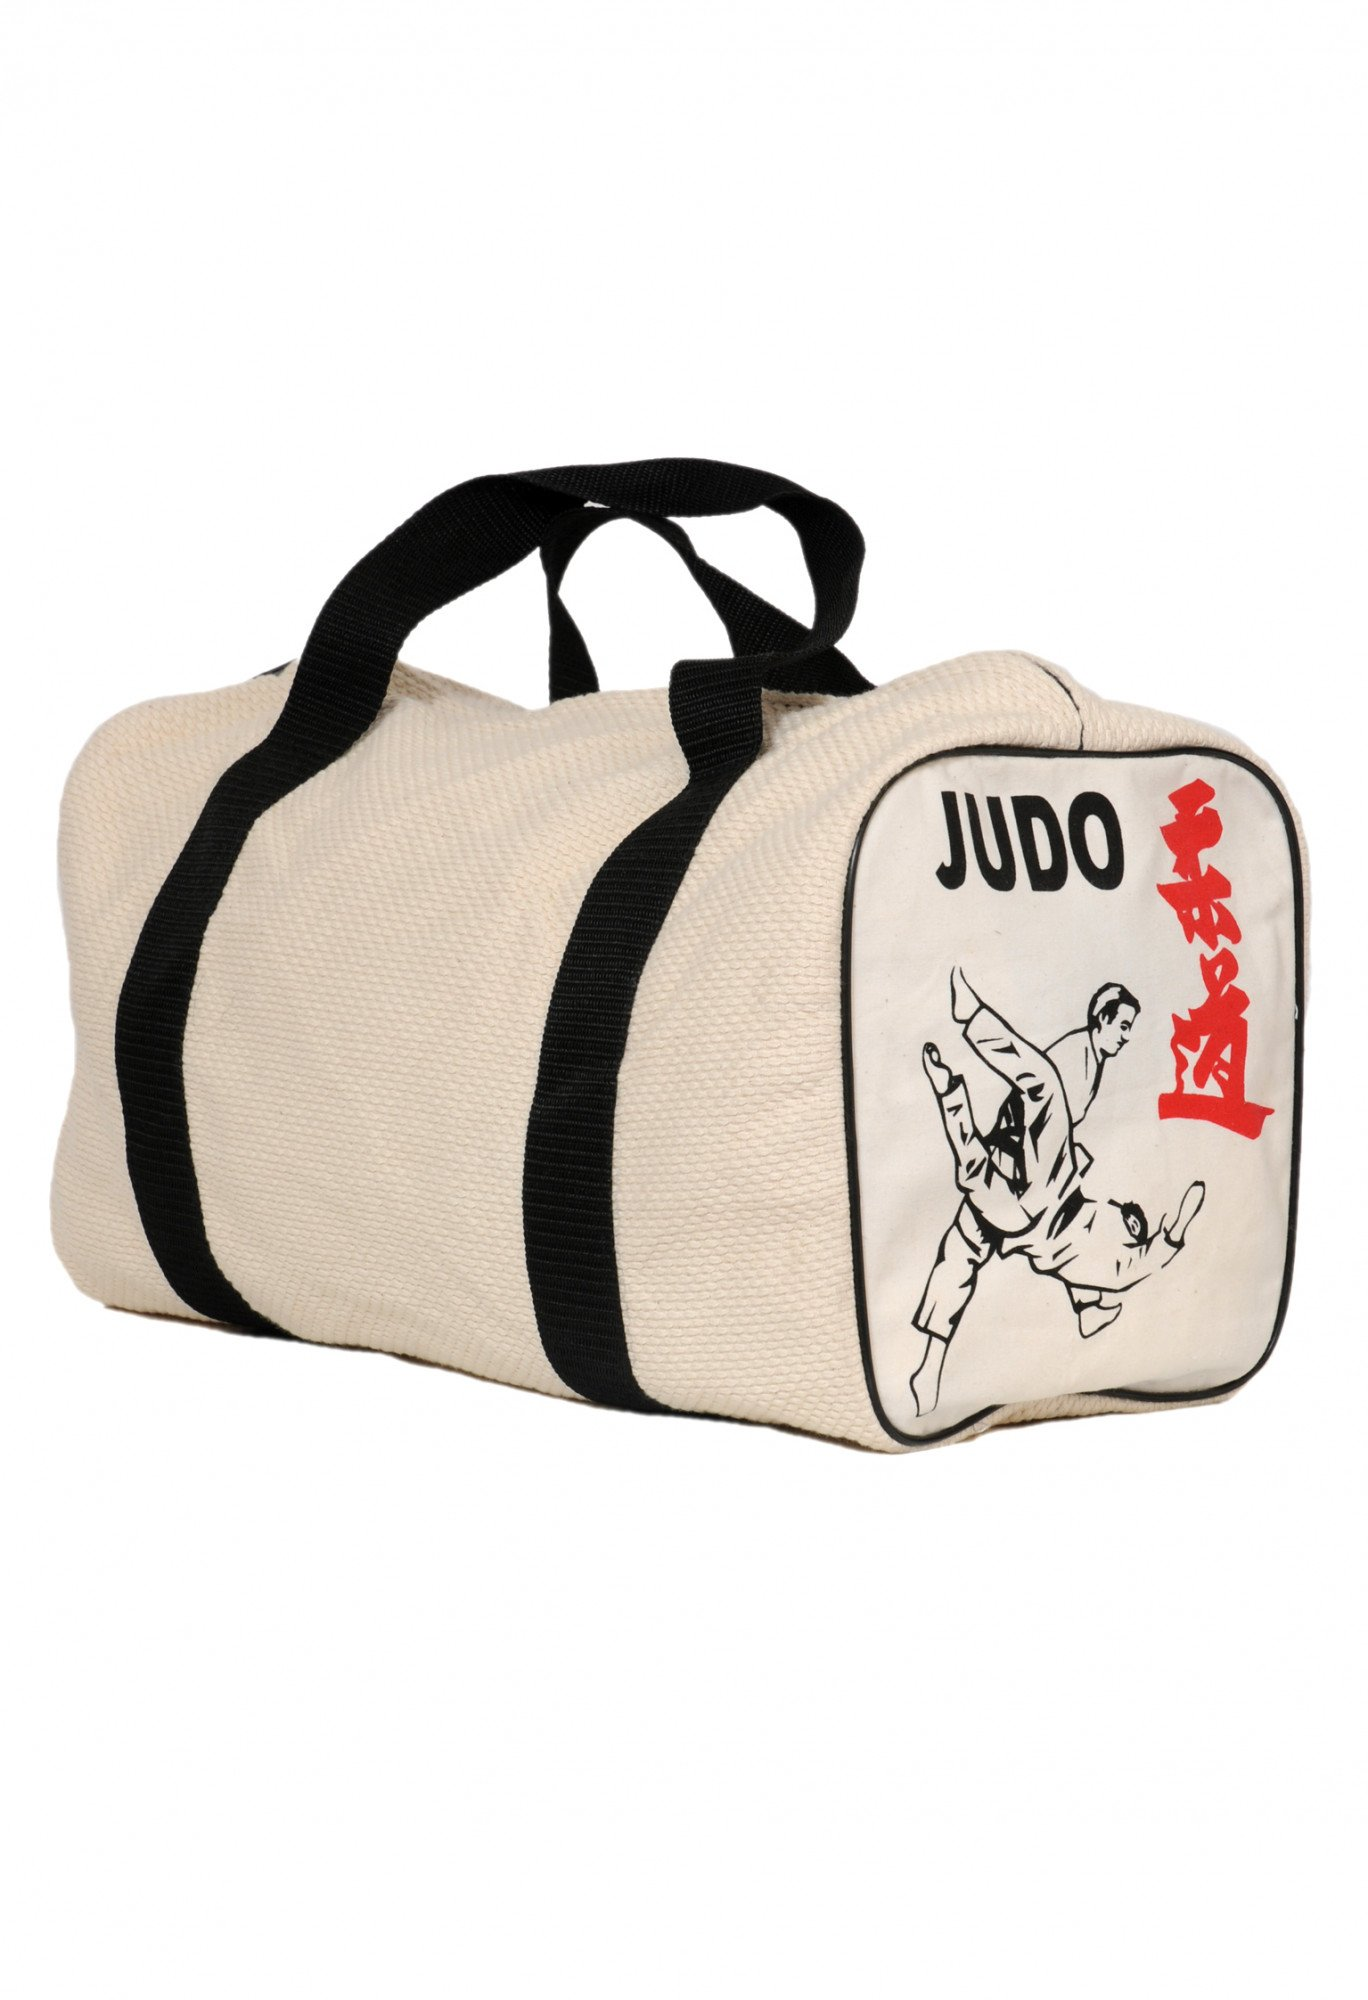 De Sac Judo Riz Enfant Sport Grain Coton mnNO8v0w